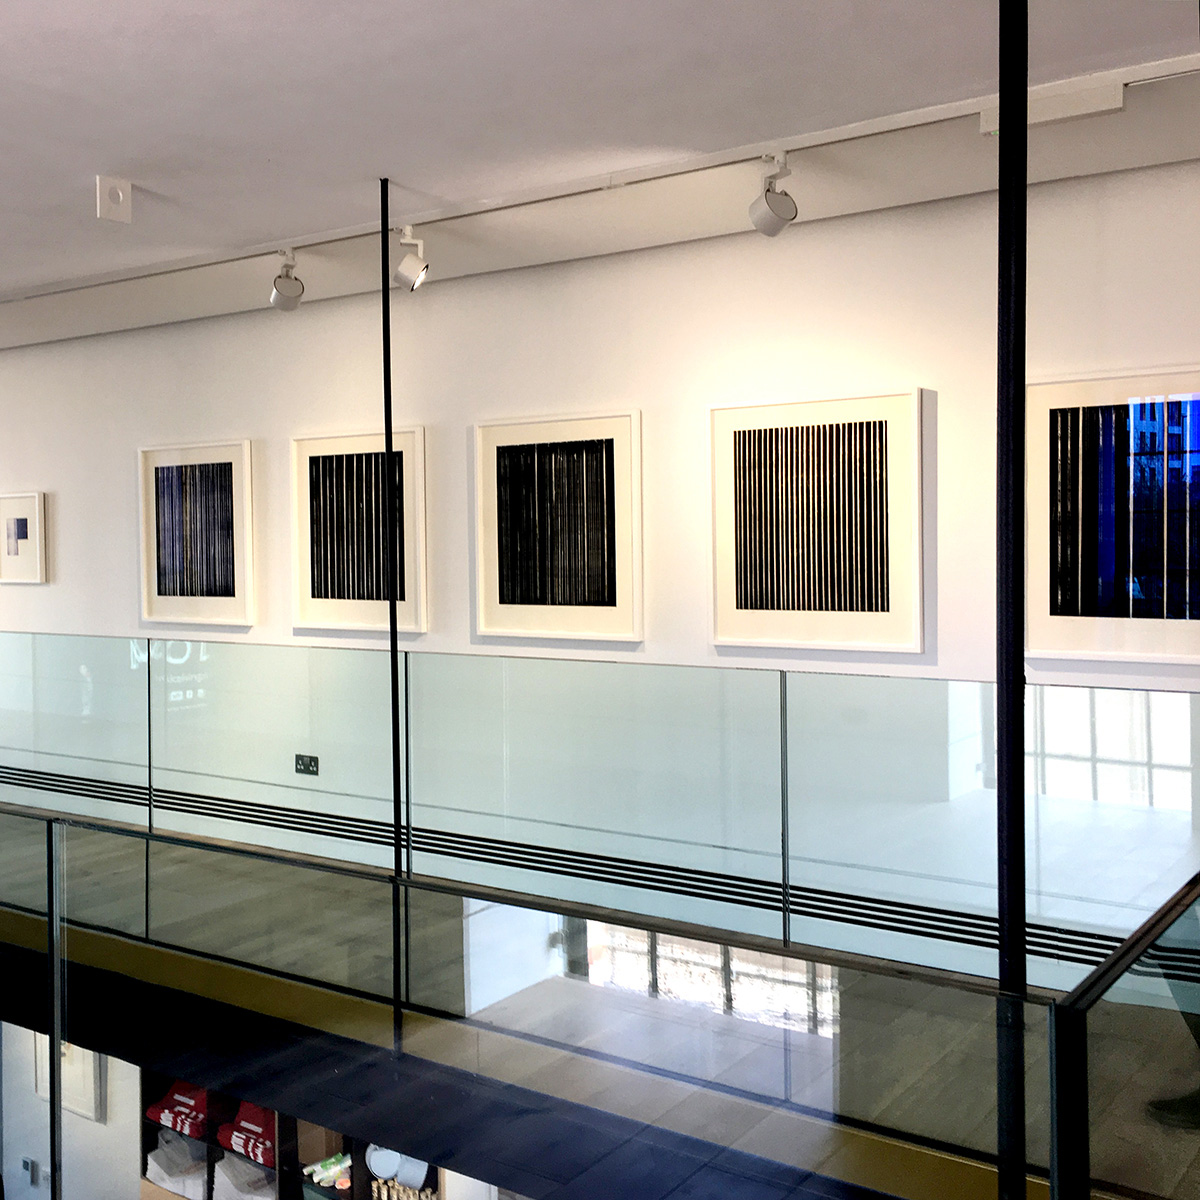 Gallery 2 display of Callum Innes: Prints 2005-2019